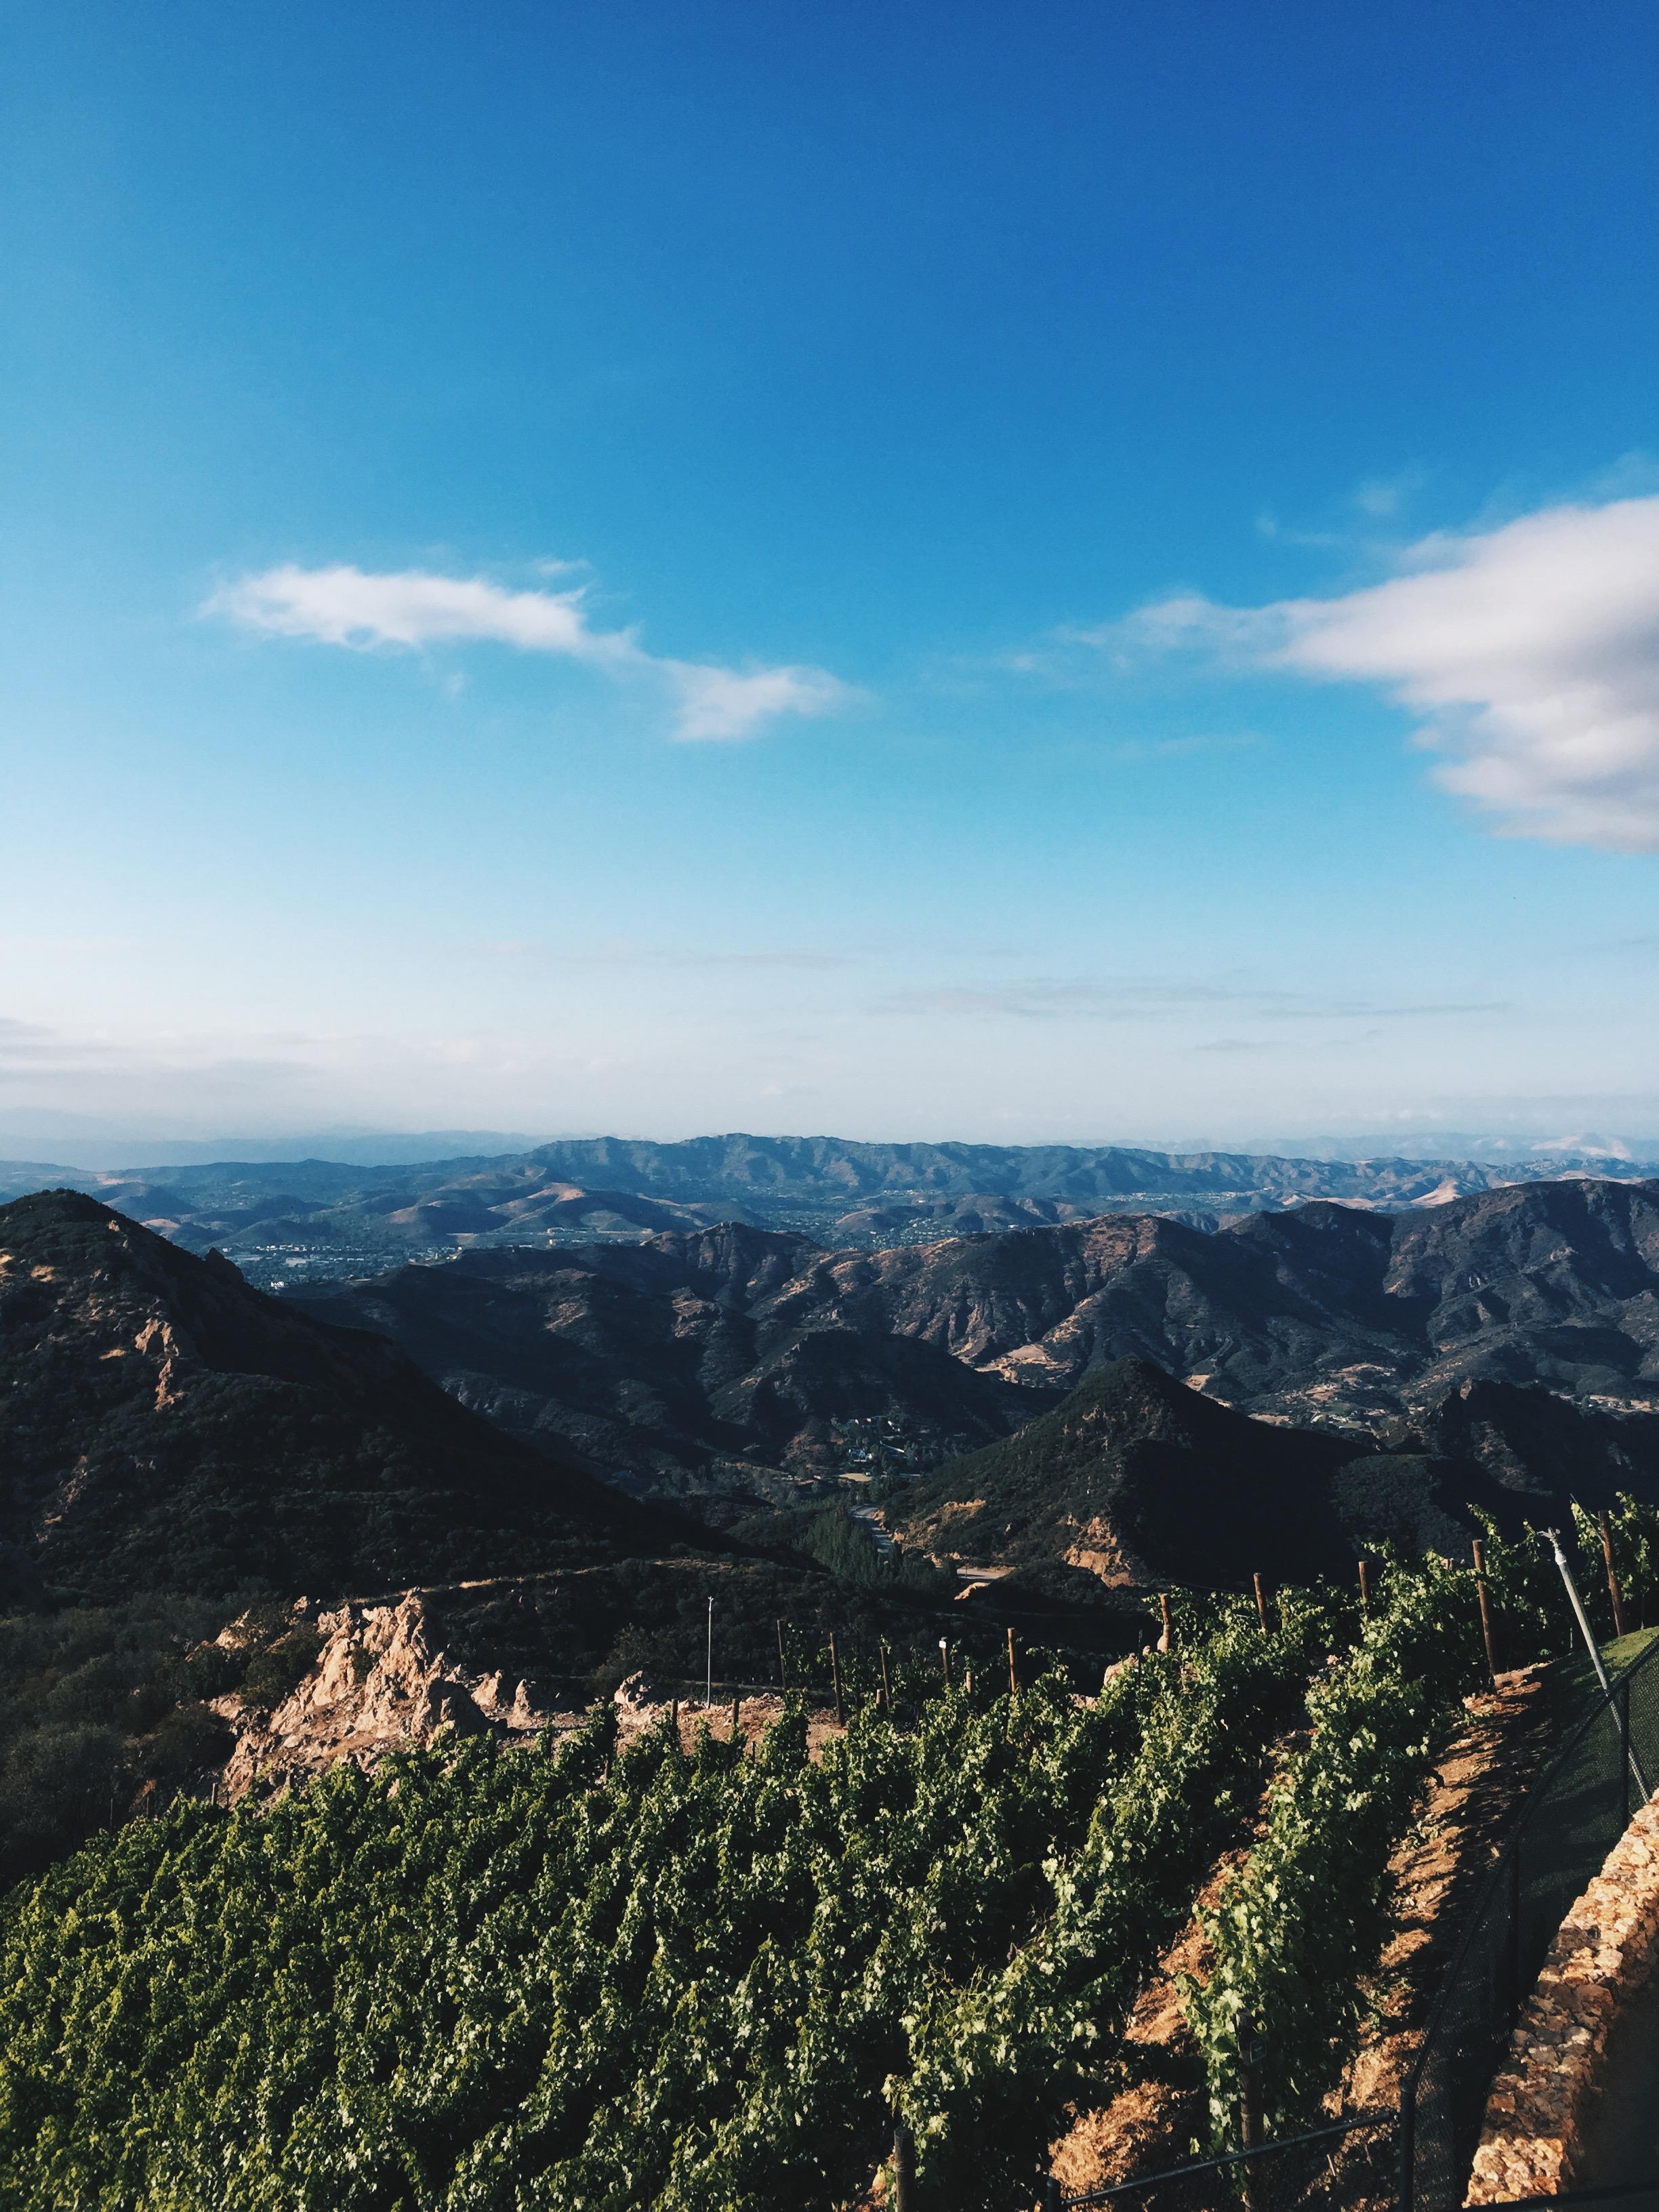 Malibu & Agoura Hills, California